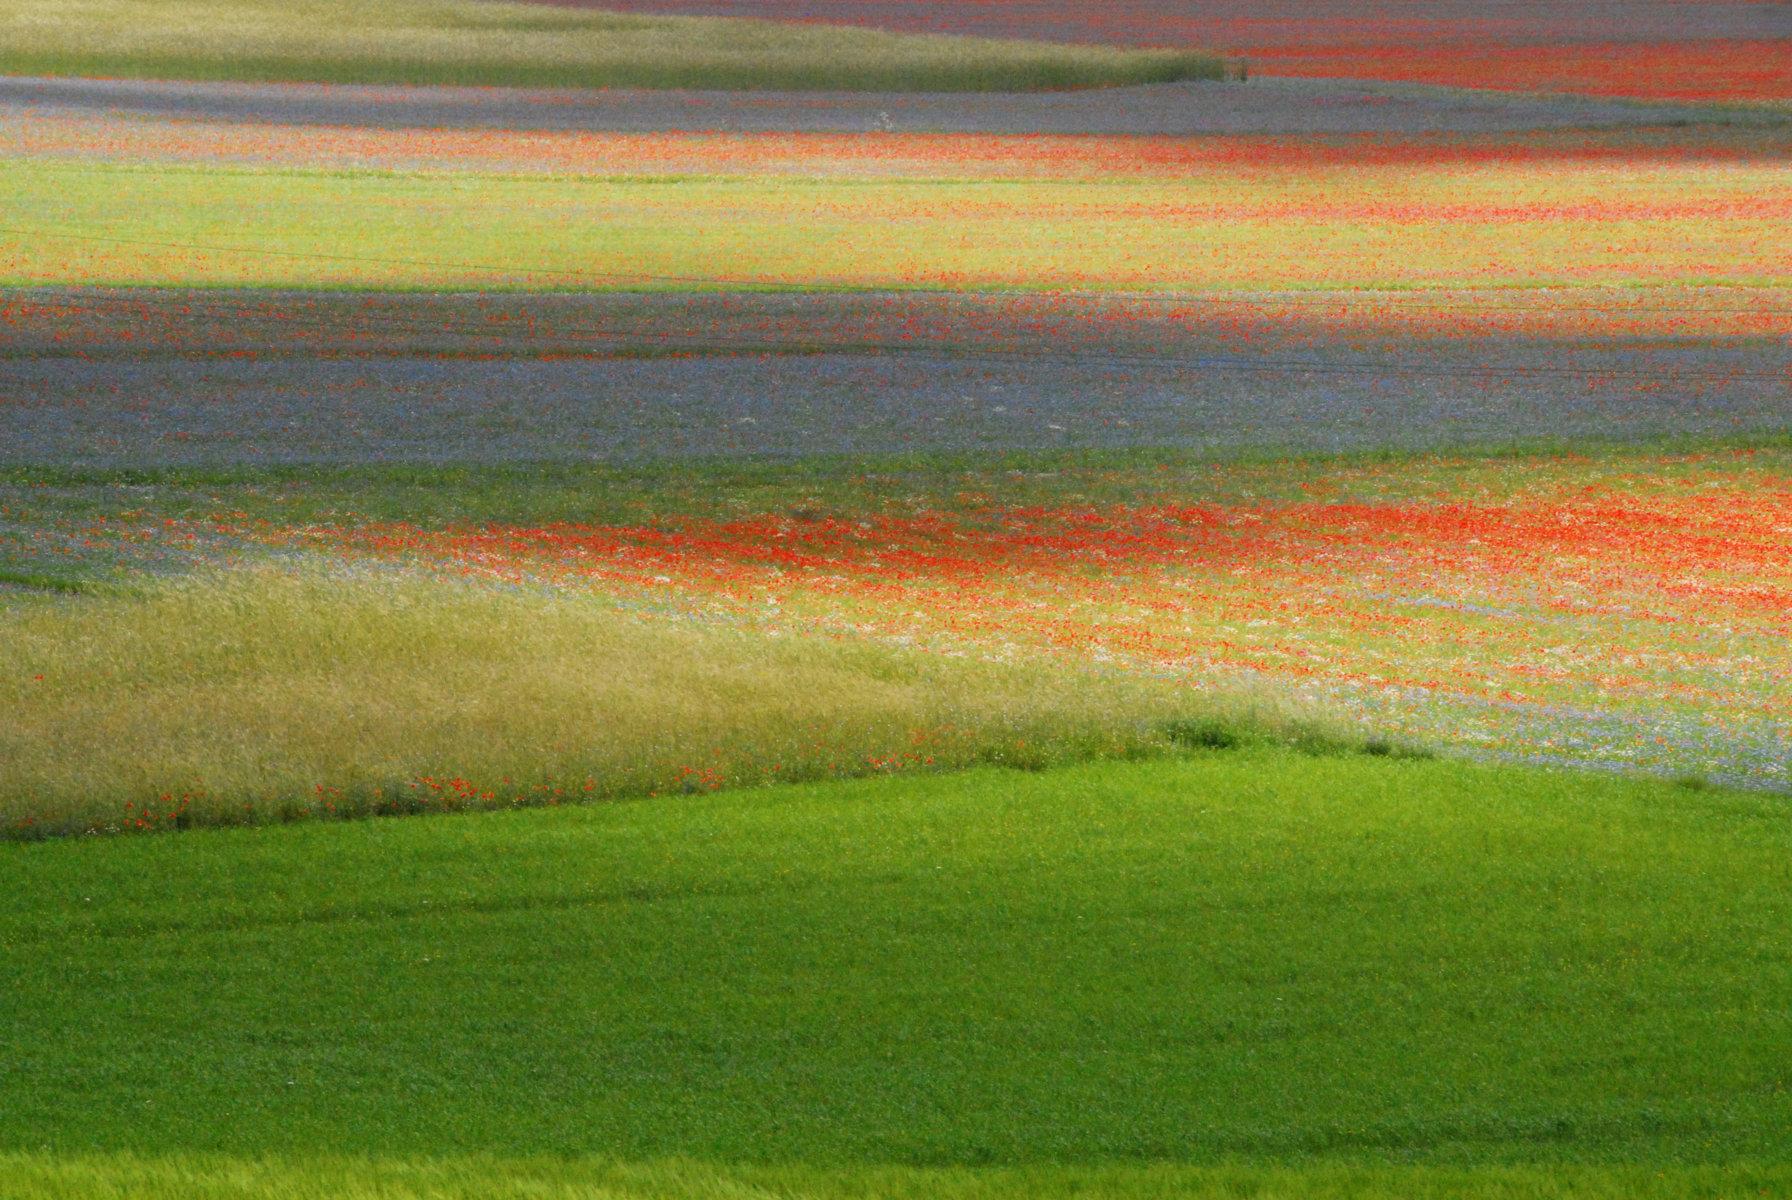 2014-la-fiorita-1a-392-fileminimizer